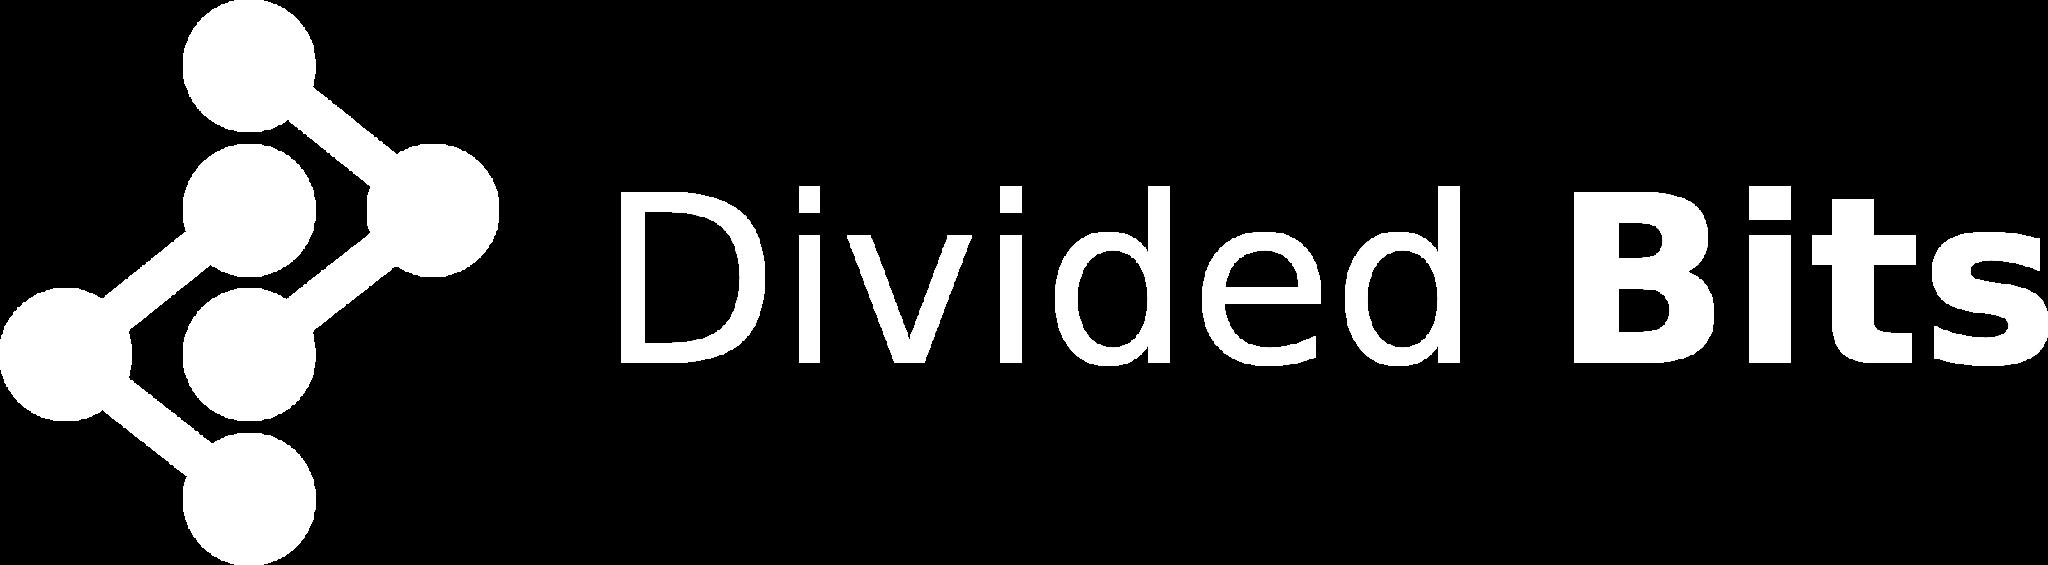 Divided Bits